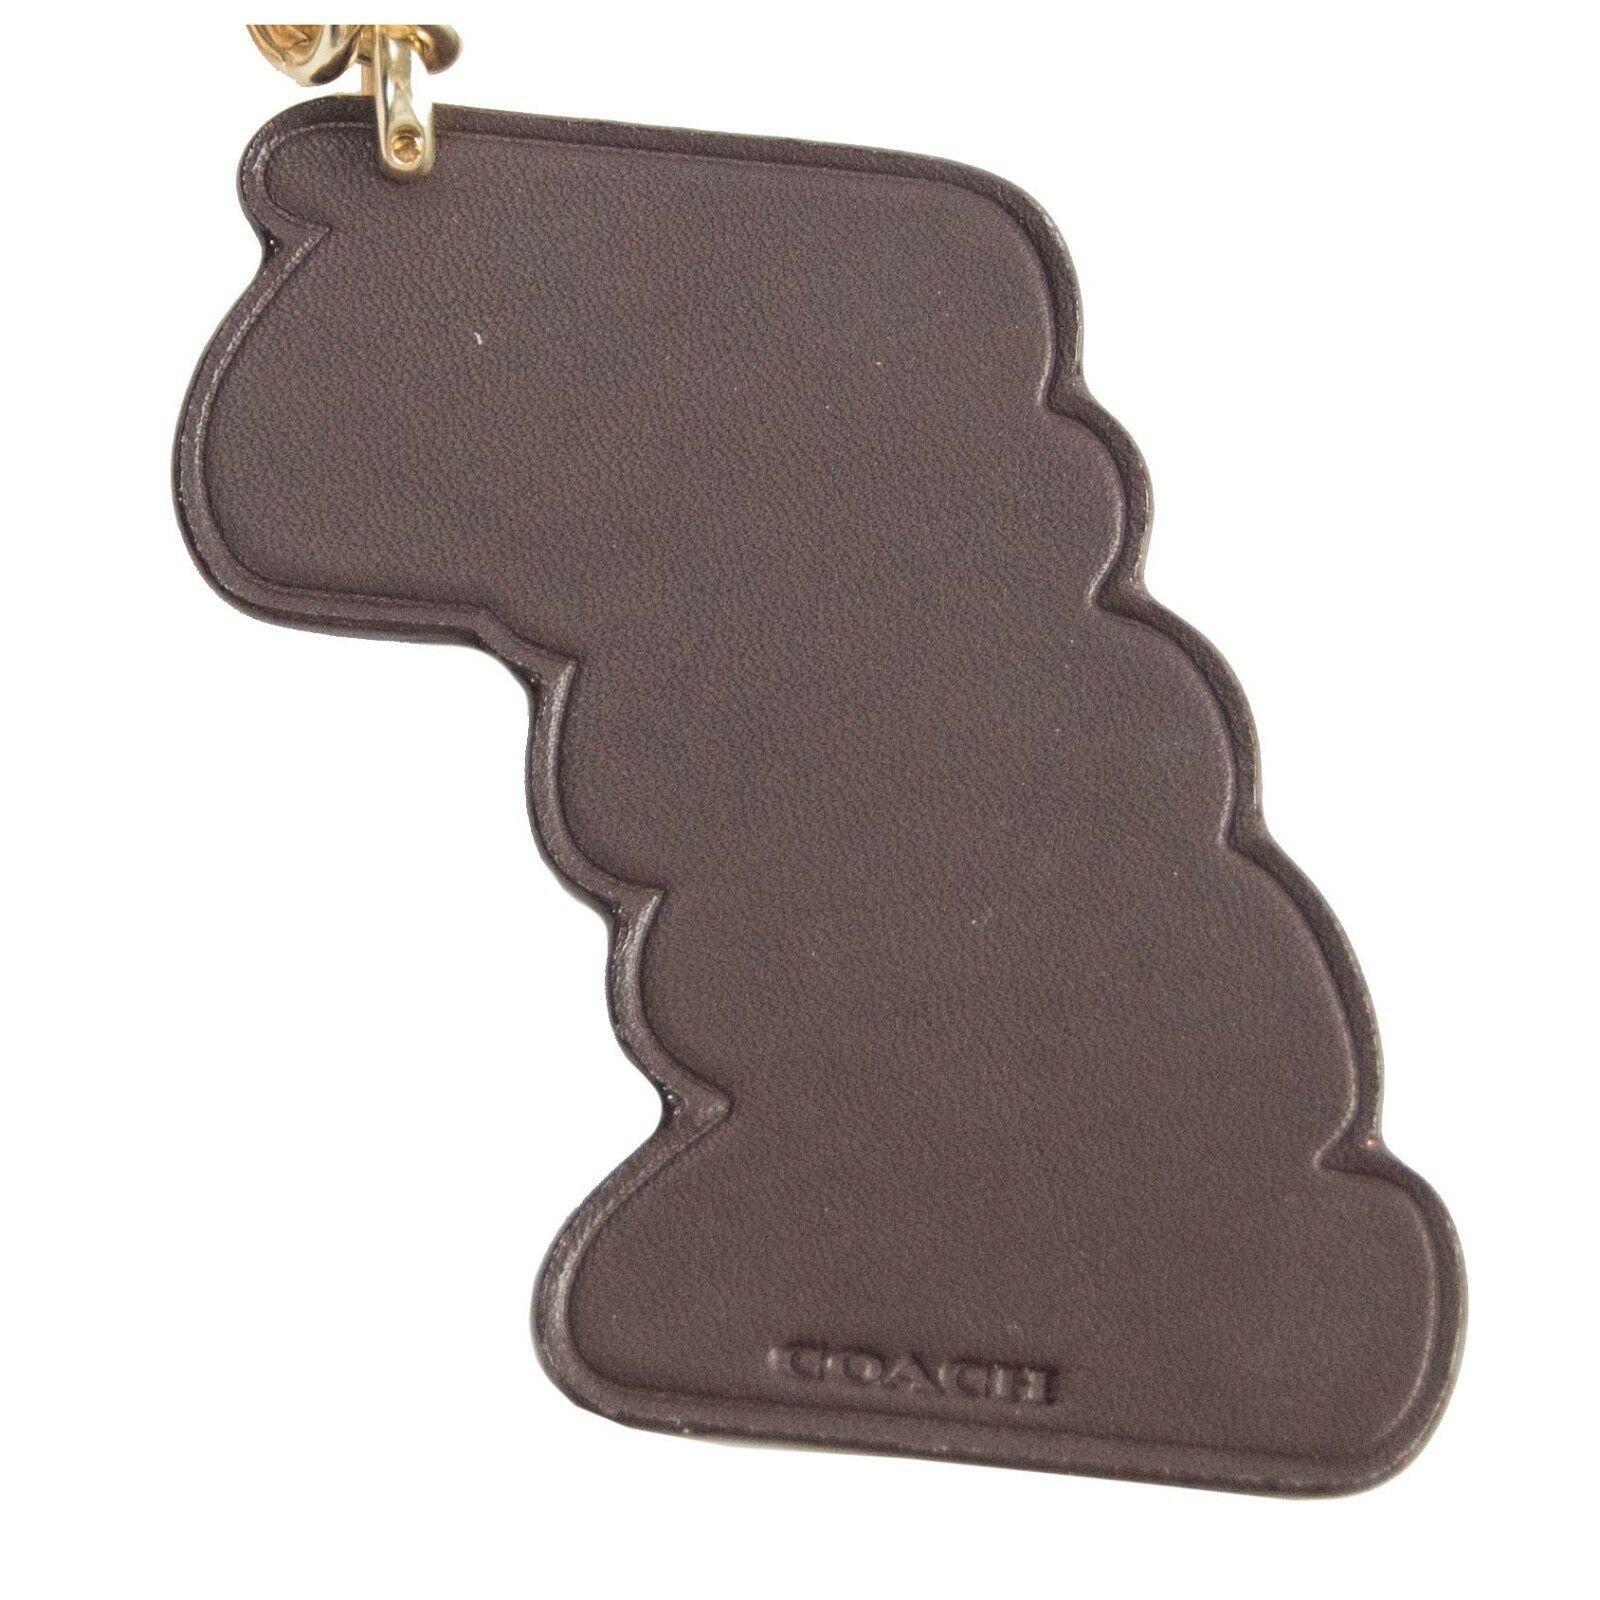 Coach Oxblood Leather Pink Glitter Retro Logo Key Chain Bag Charm 35546 NWT image 5